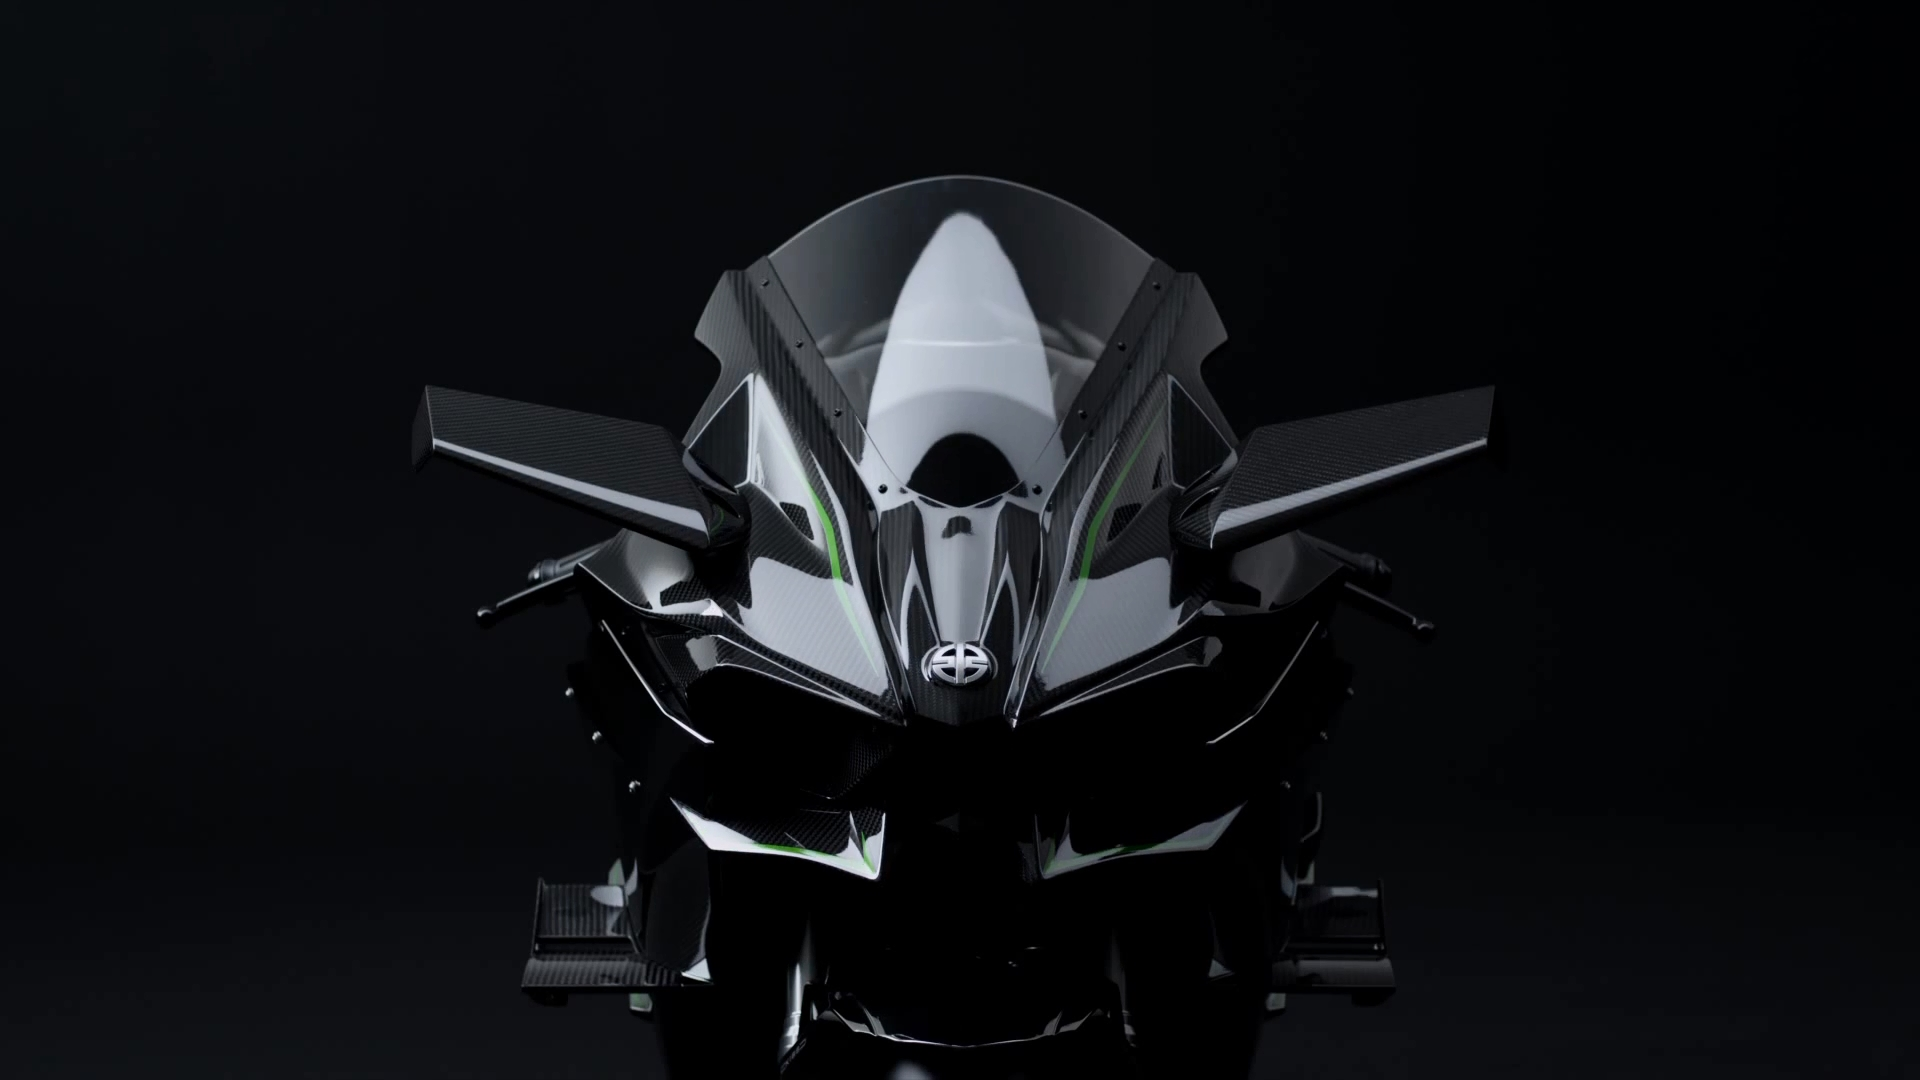 Here You Go H2r Wallpaper Kawasaki Ninja H2r Wallpaper Kawasaki